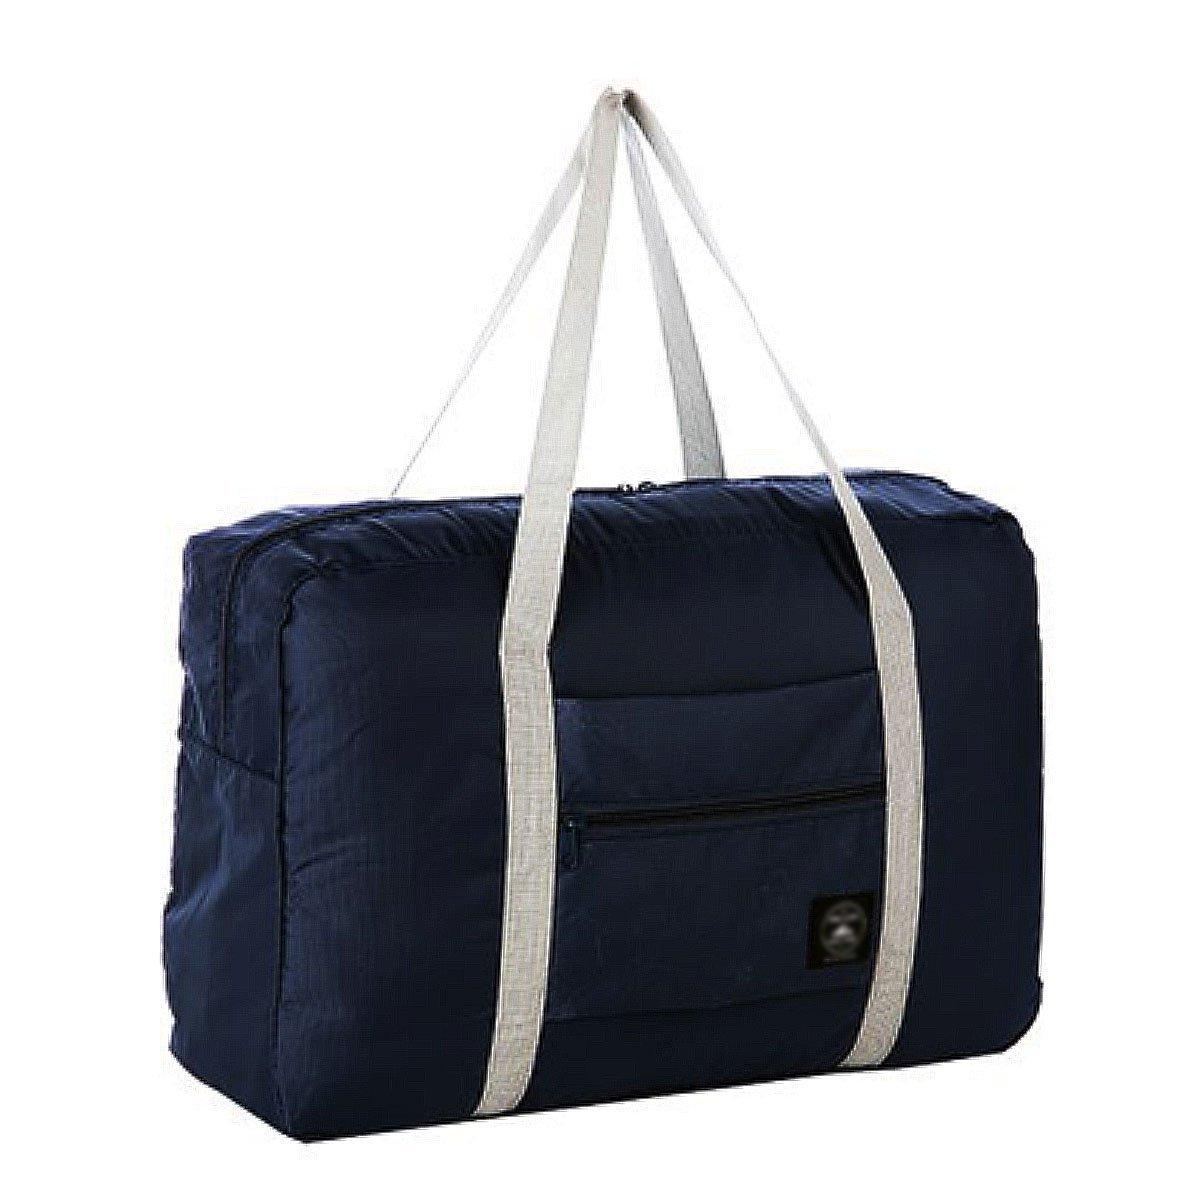 Aisa Womens & Mens Foldable Travel Waterproof Duffel Bag Large Capacity Luggage Bag Storage Shopping Bag